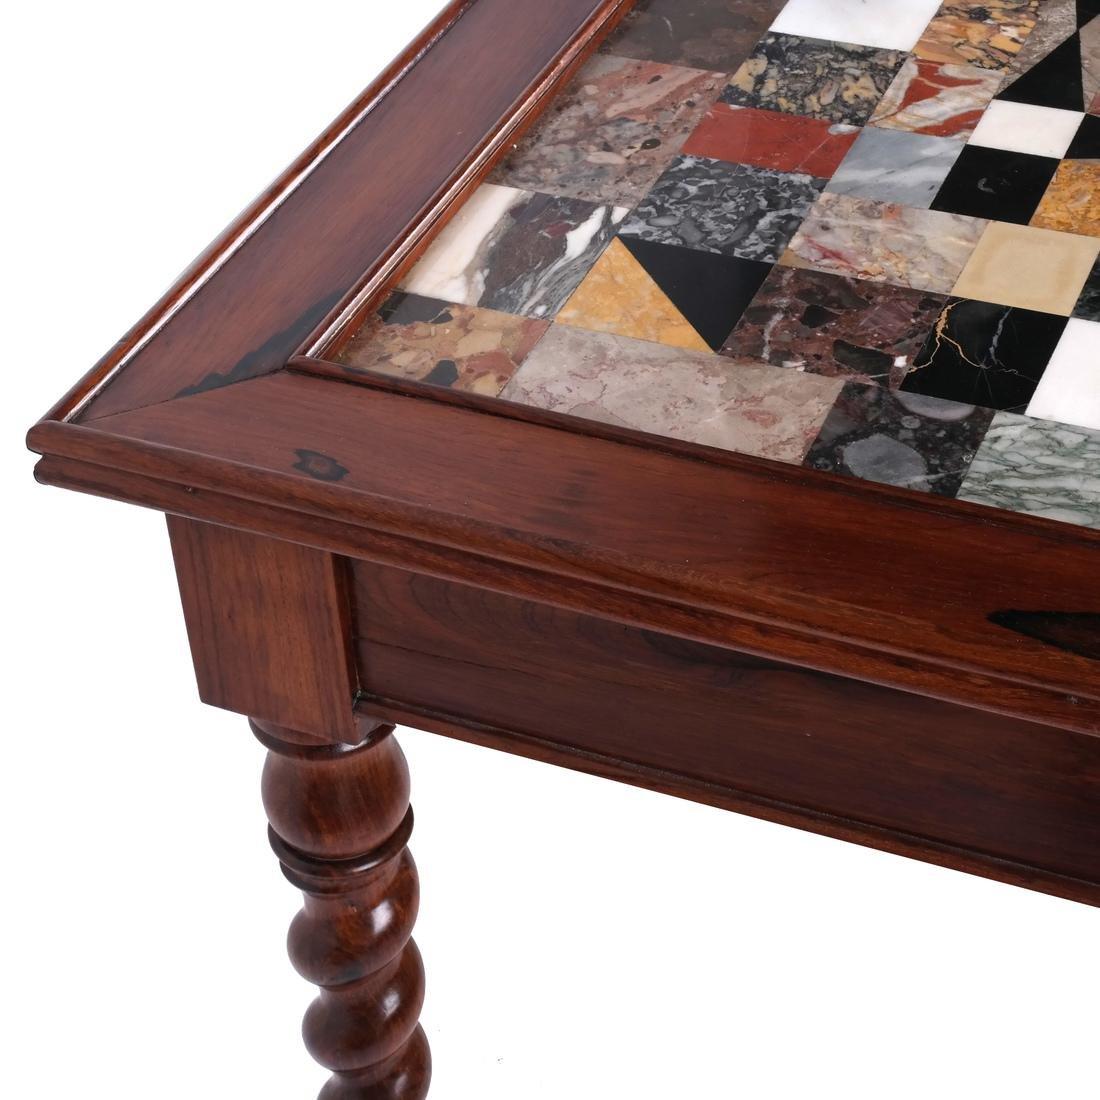 Antique Specimen Marble Top Table - 6